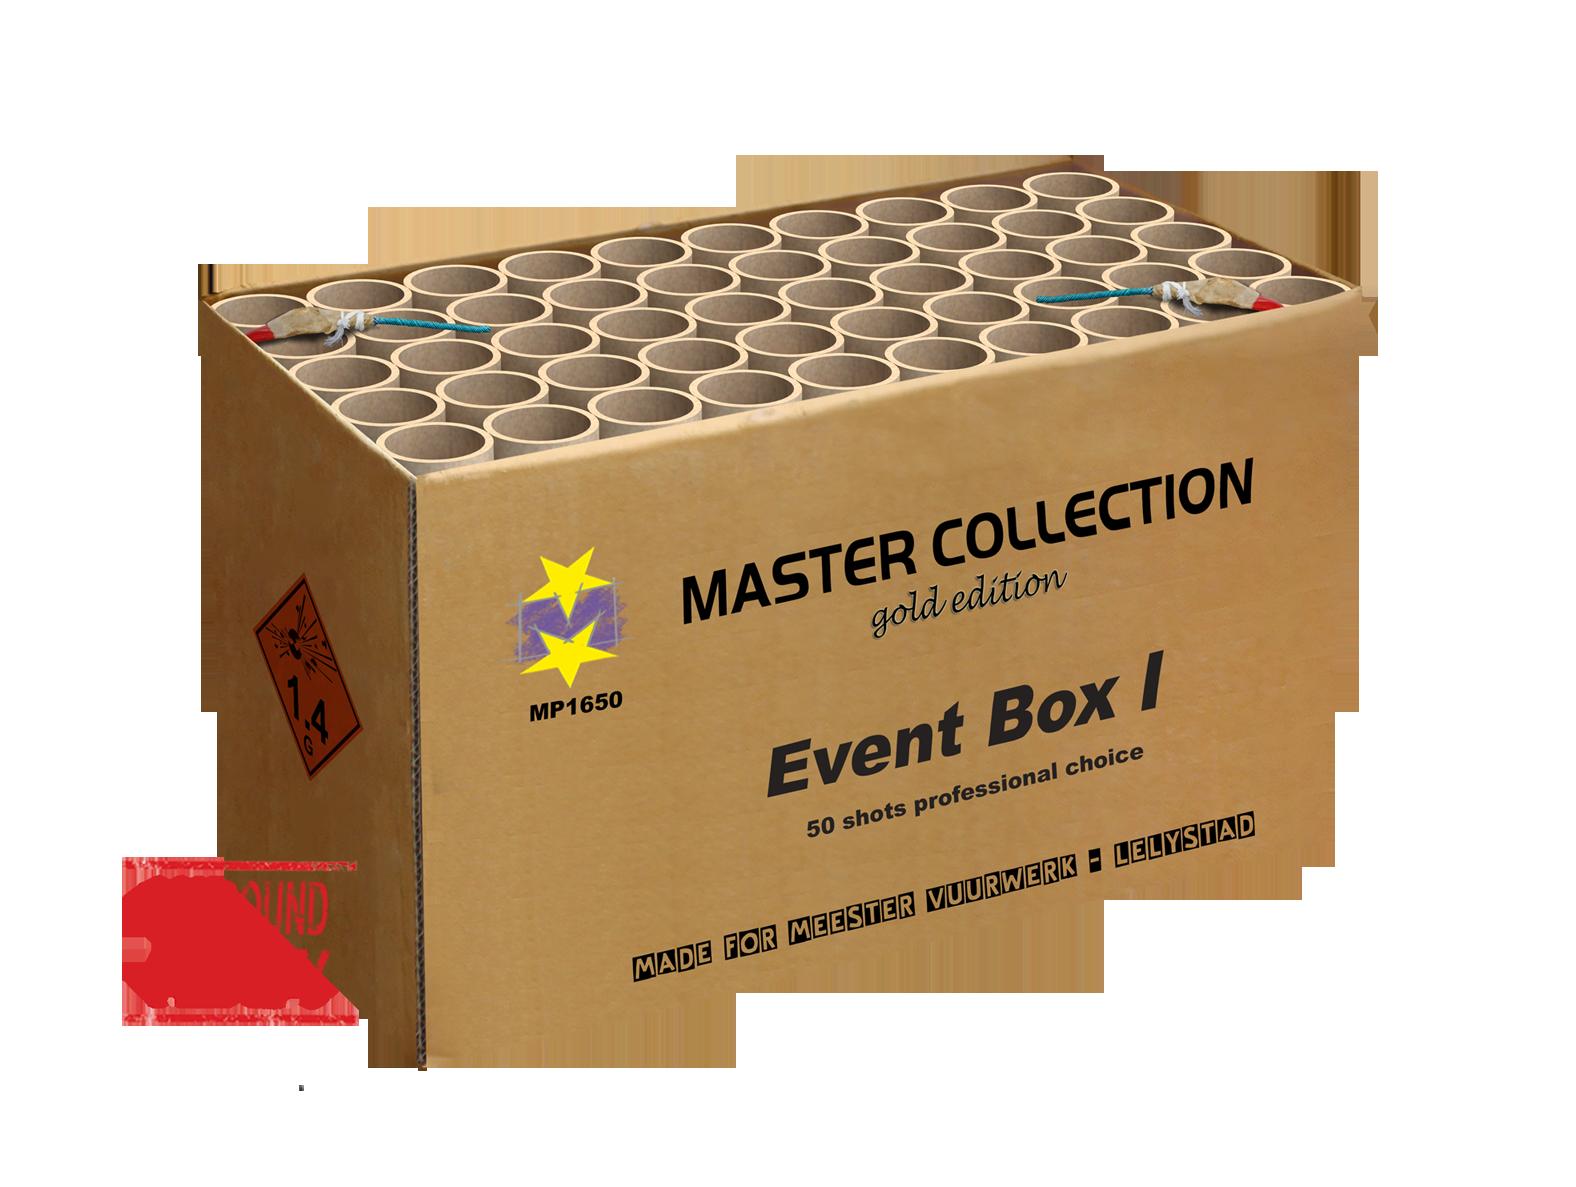 Event Box I